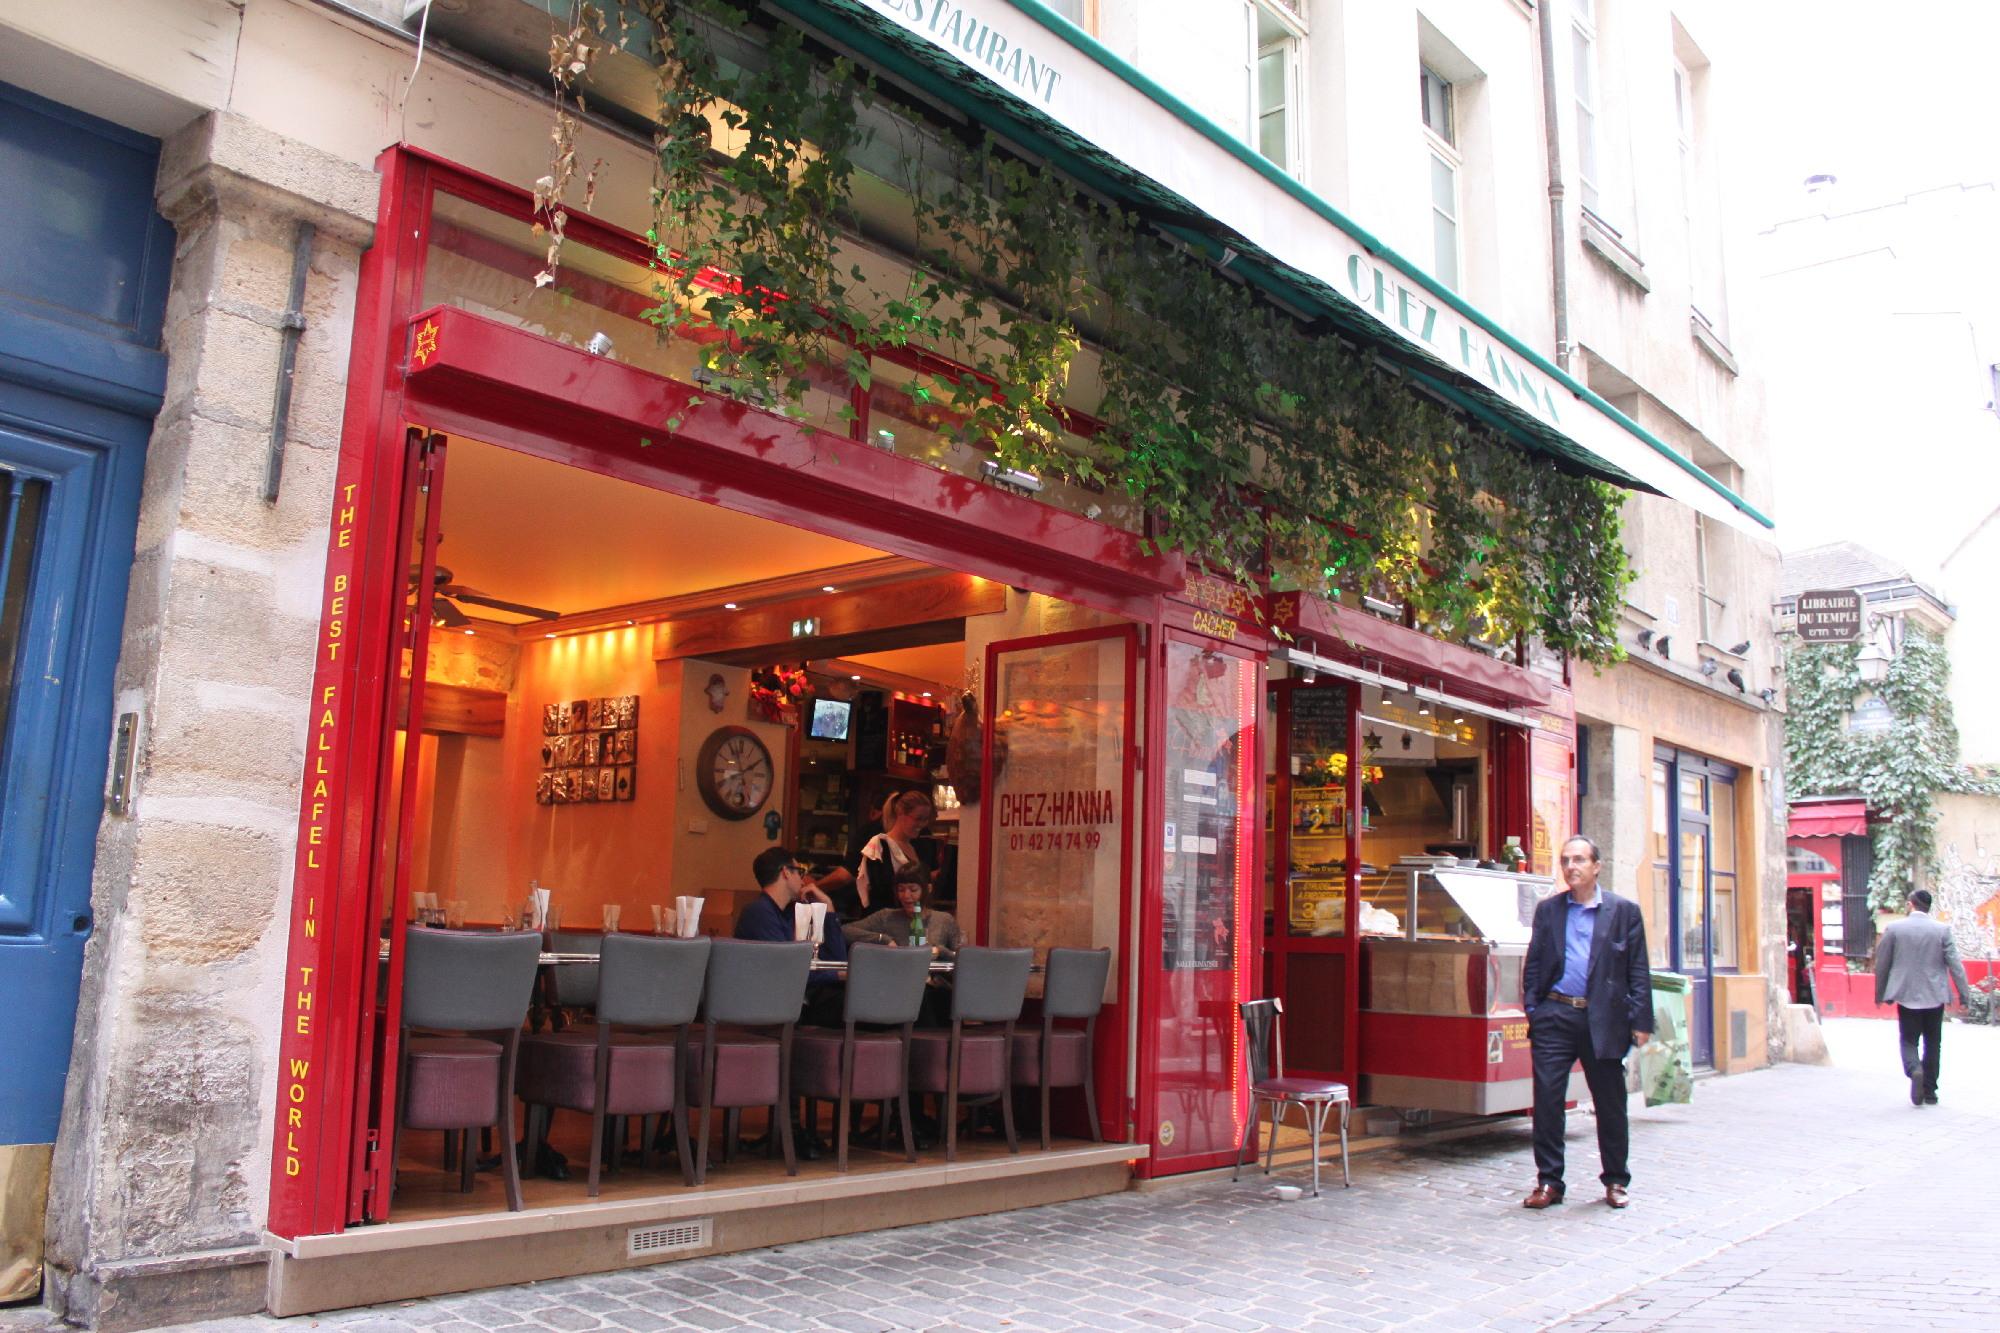 Restaurant: Chez Hanna